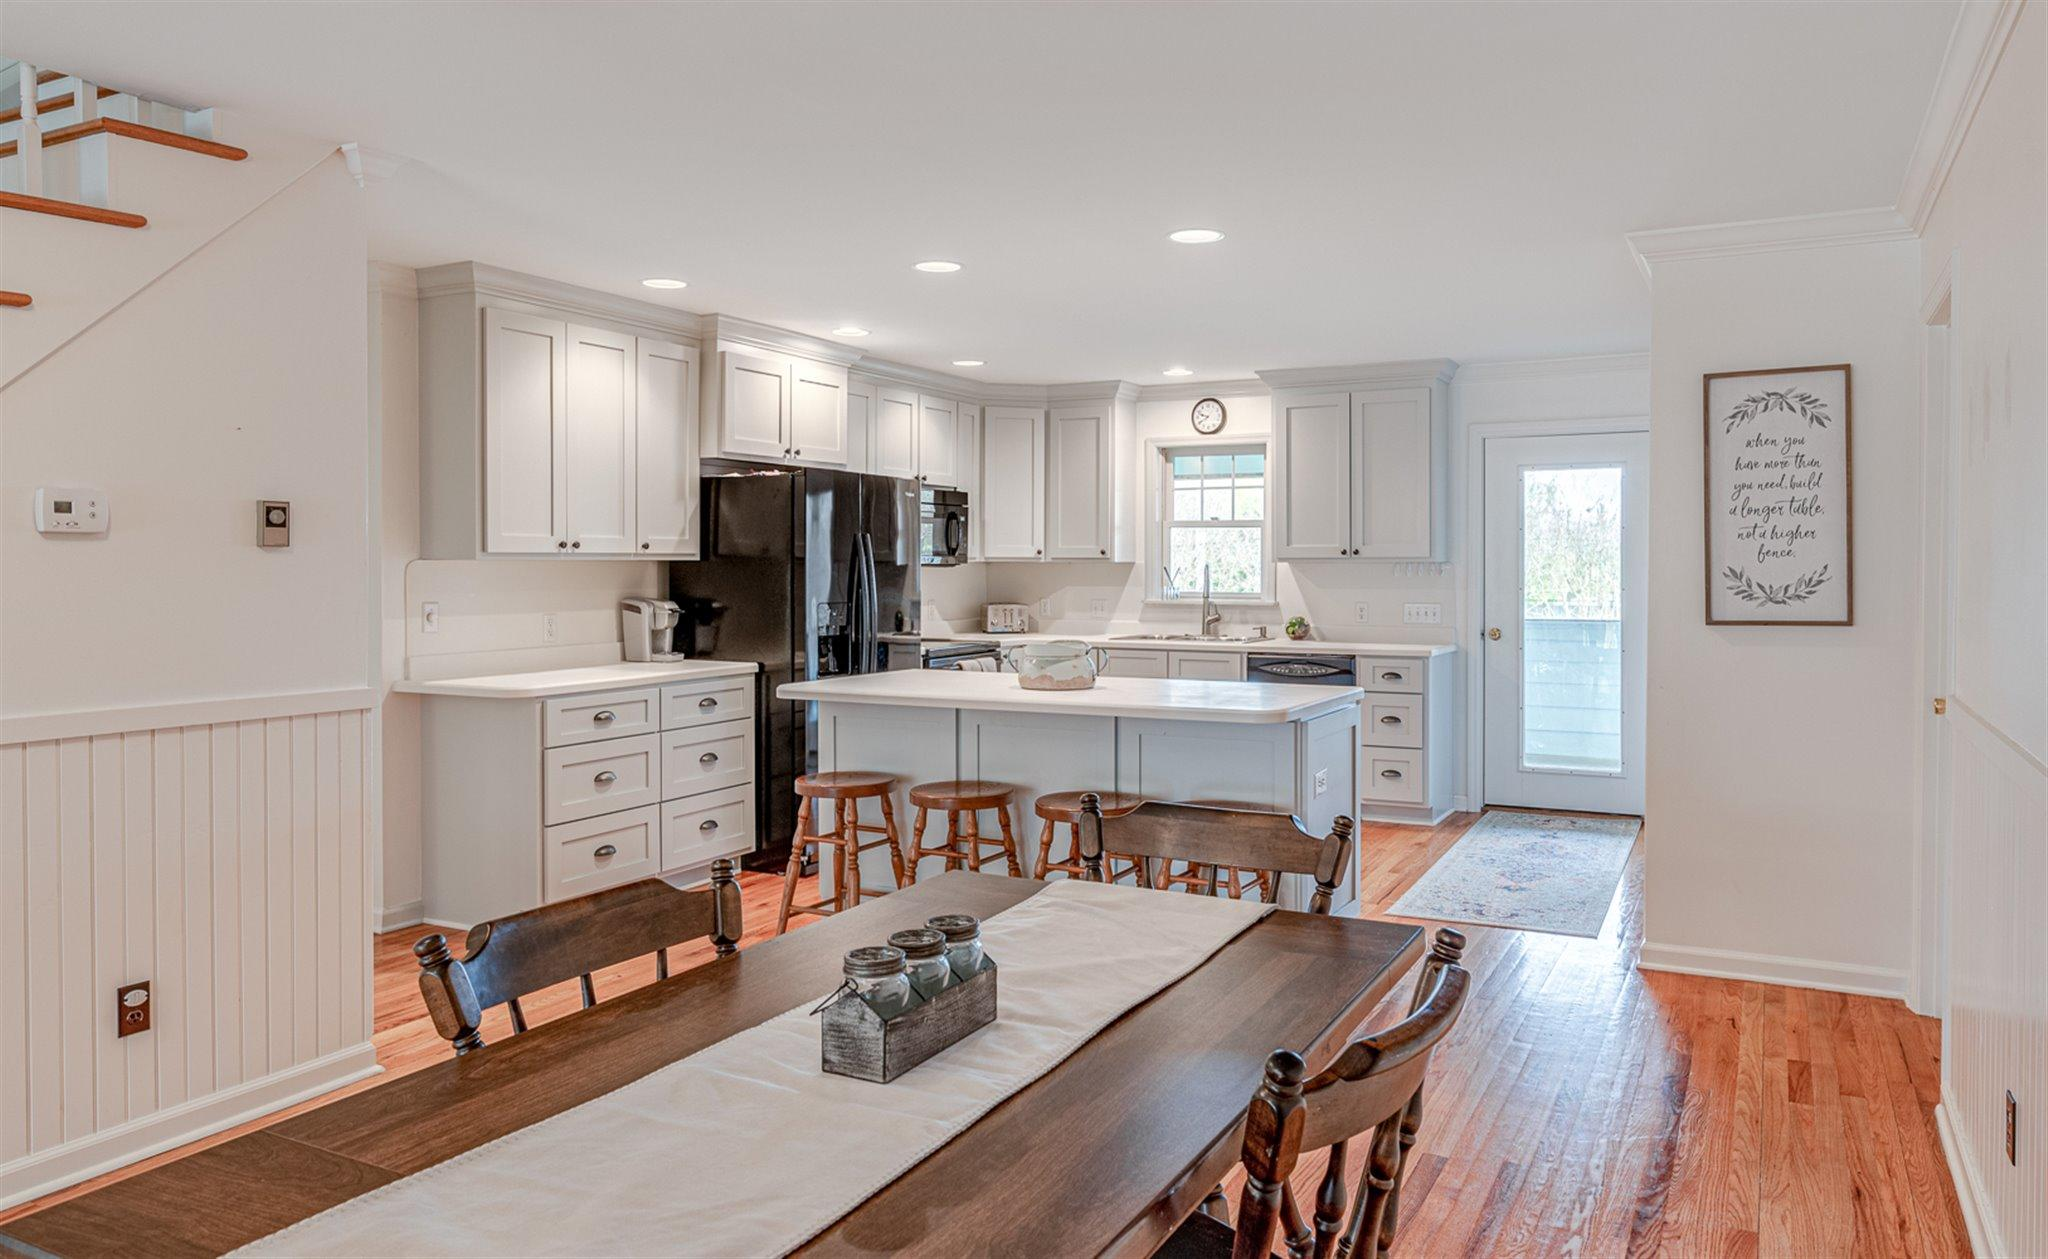 Sullivans Island Homes For Sale - 2107 Middle, Sullivans Island, SC - 13